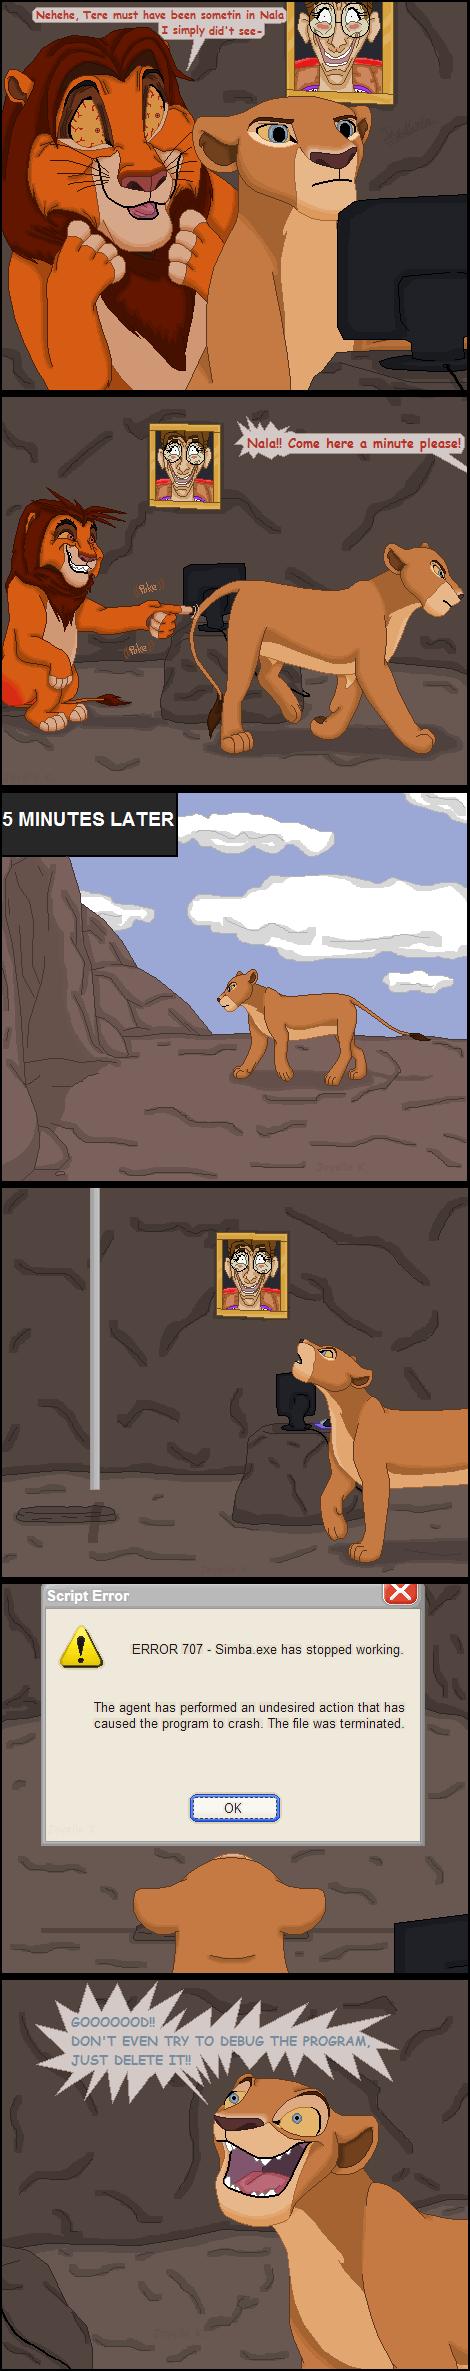 El arte de TLK-Peachii [Artista de DA] Simba_10